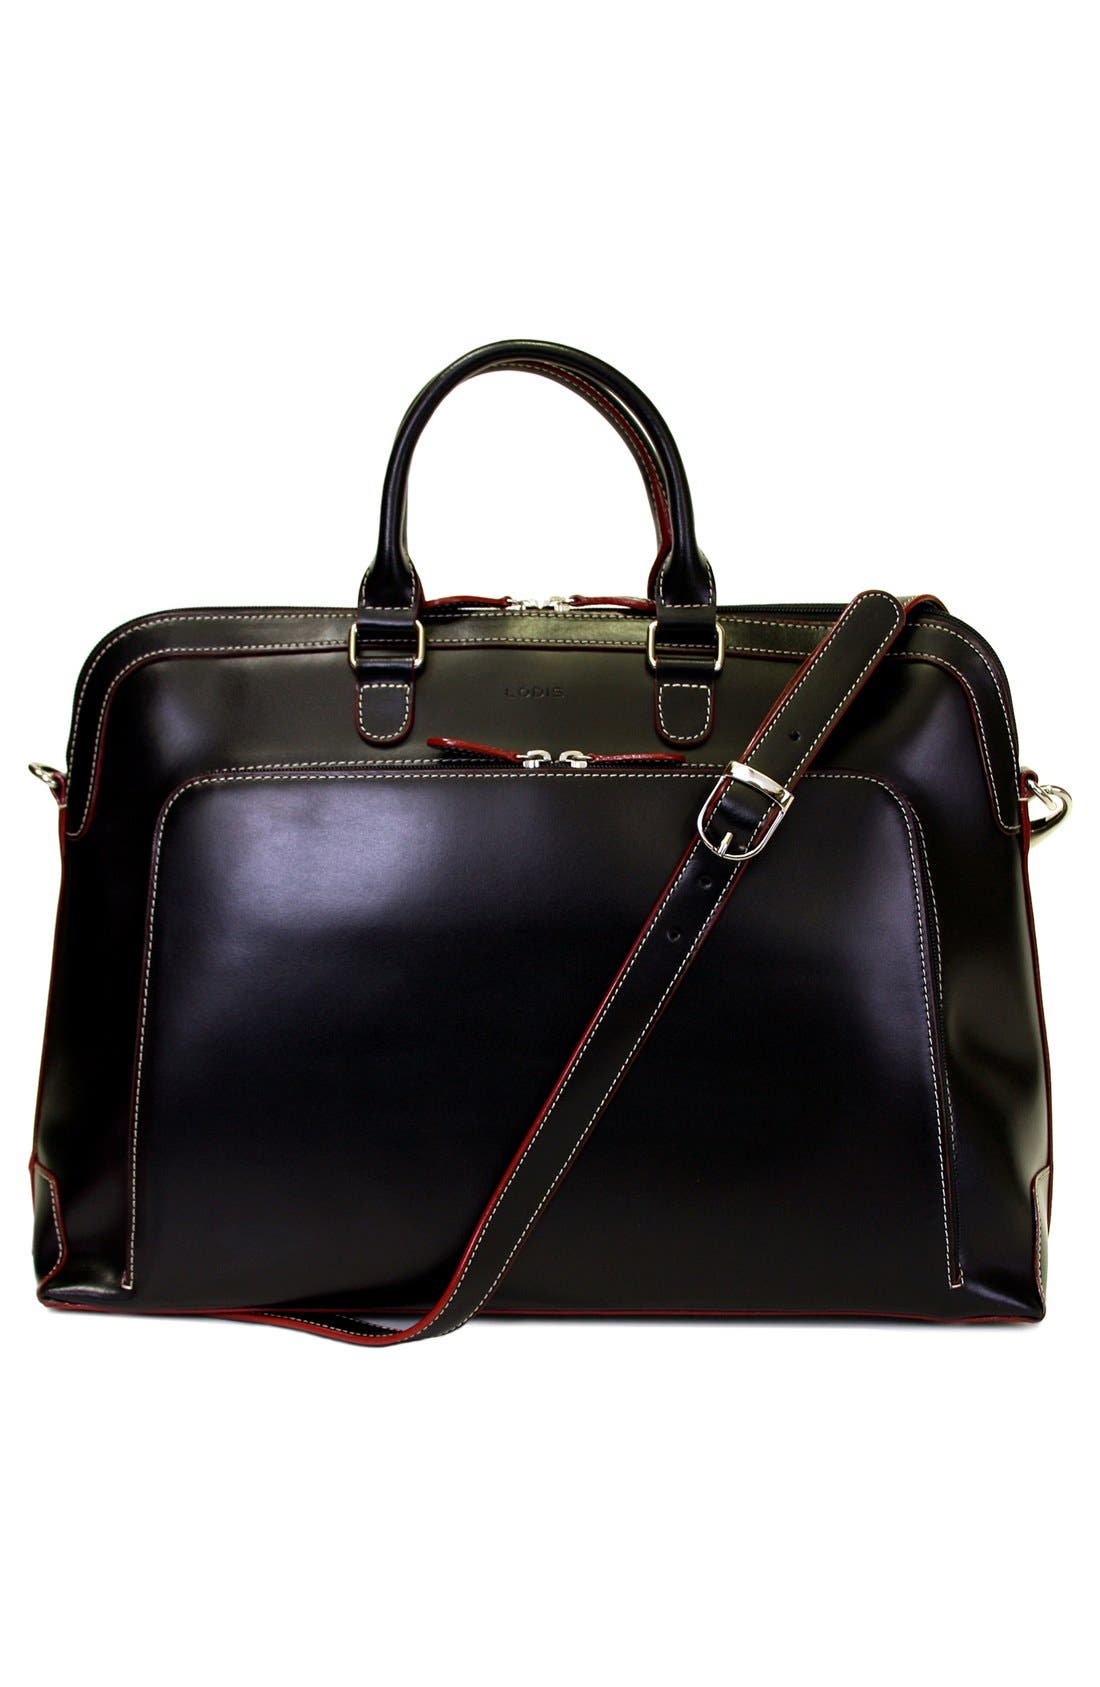 Lodis 'Audrey Brera' Leather Briefcase,                             Alternate thumbnail 7, color,                             001